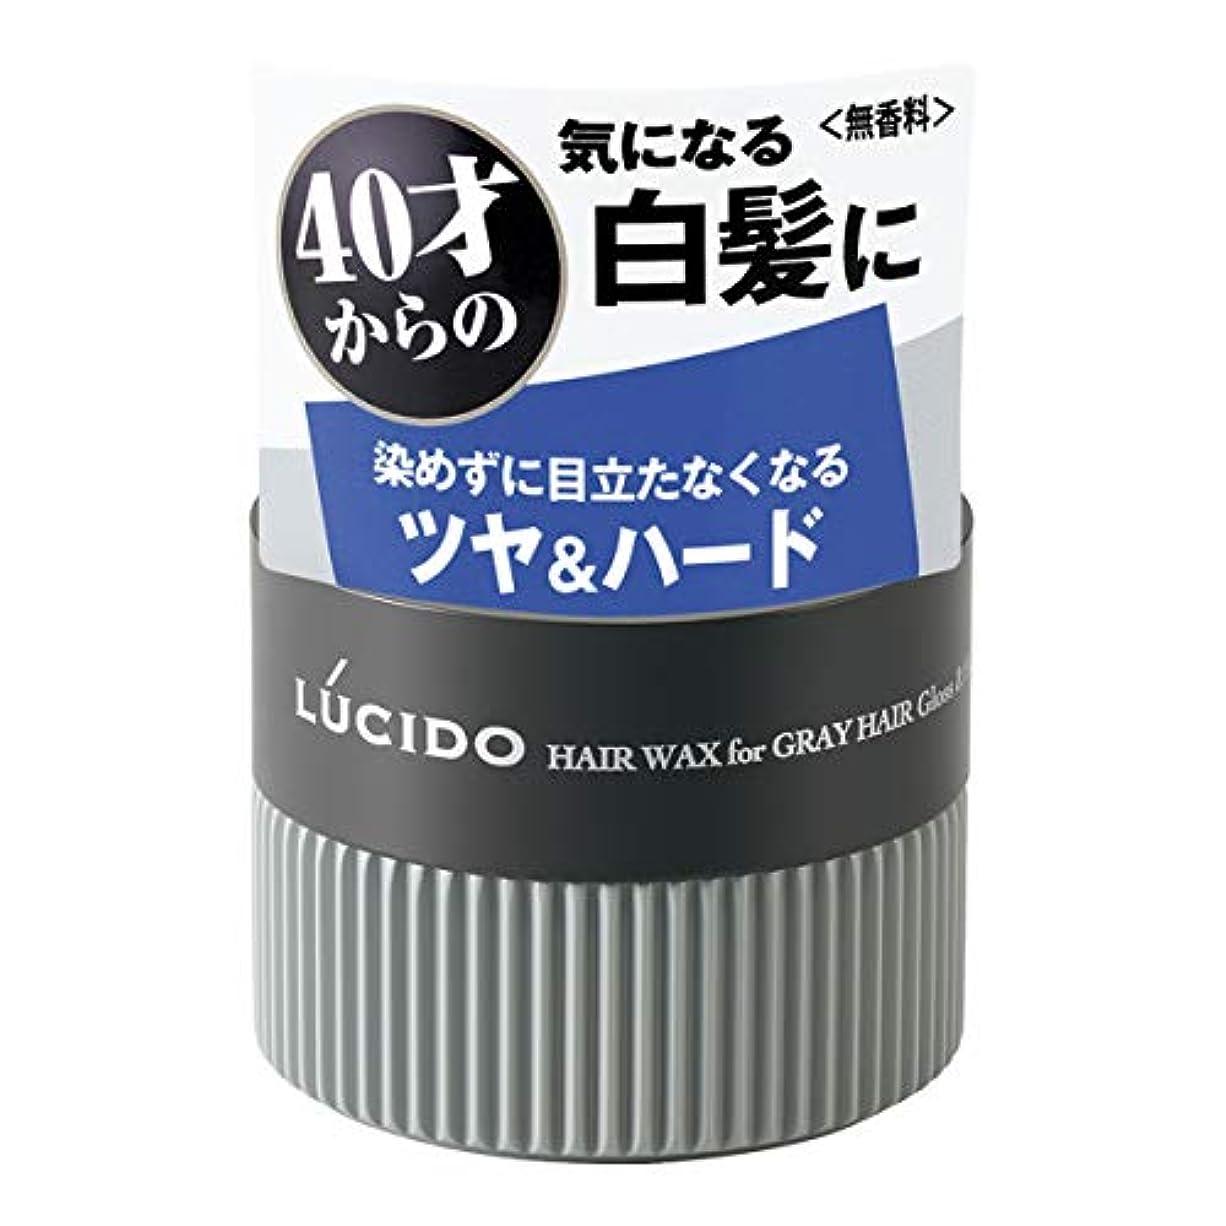 LUCIDO(ルシード) ヘアワックス 白髪用ワックス グロス&ハード 80g